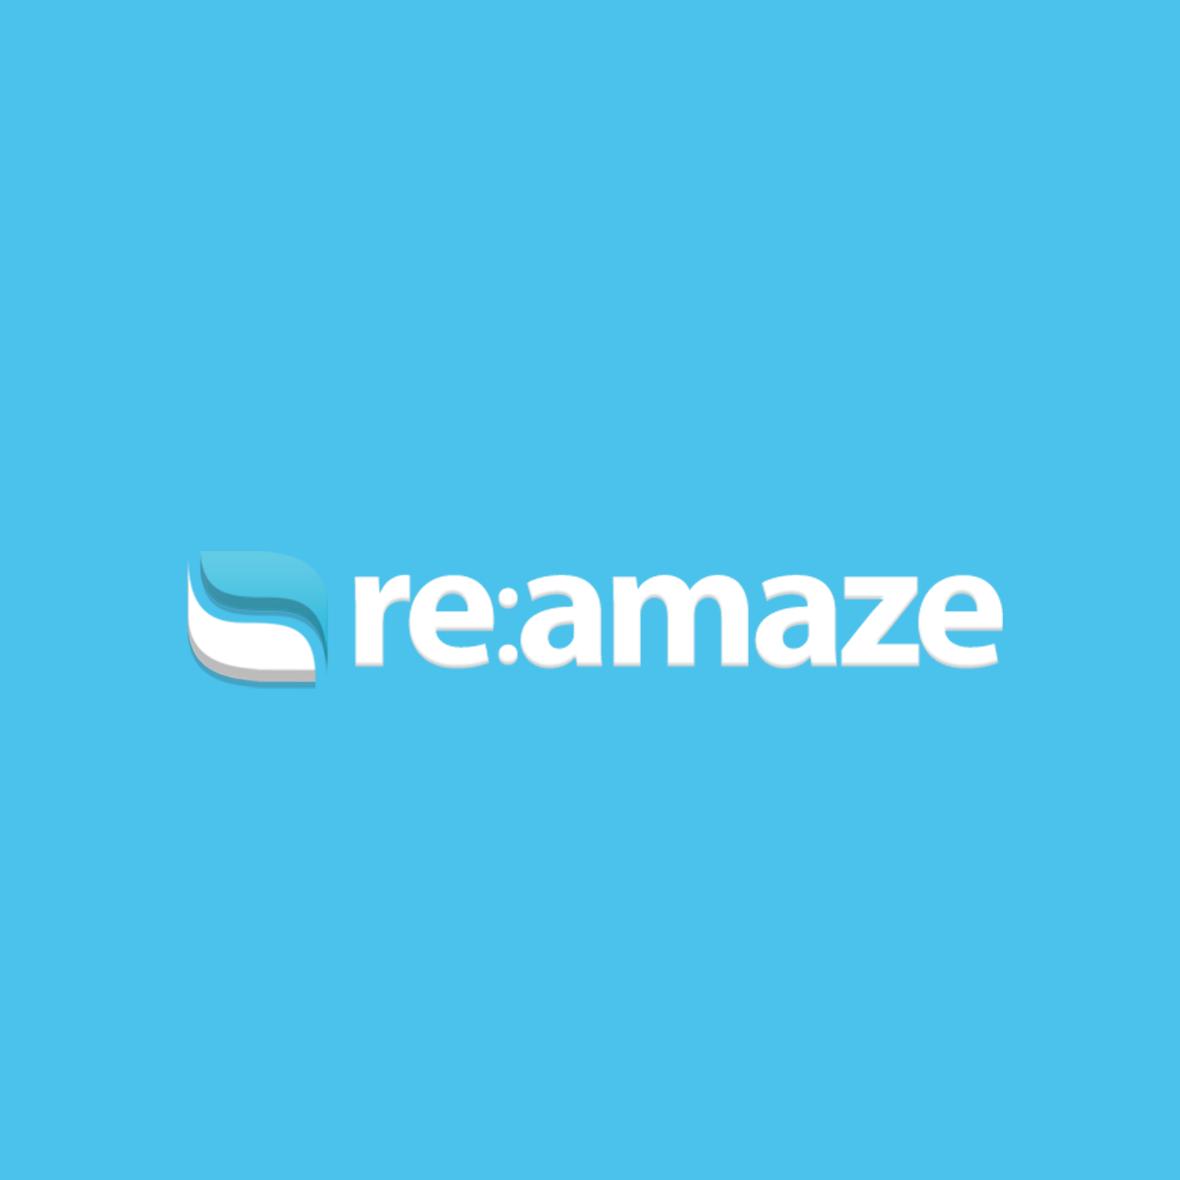 Reamaze for Shopify